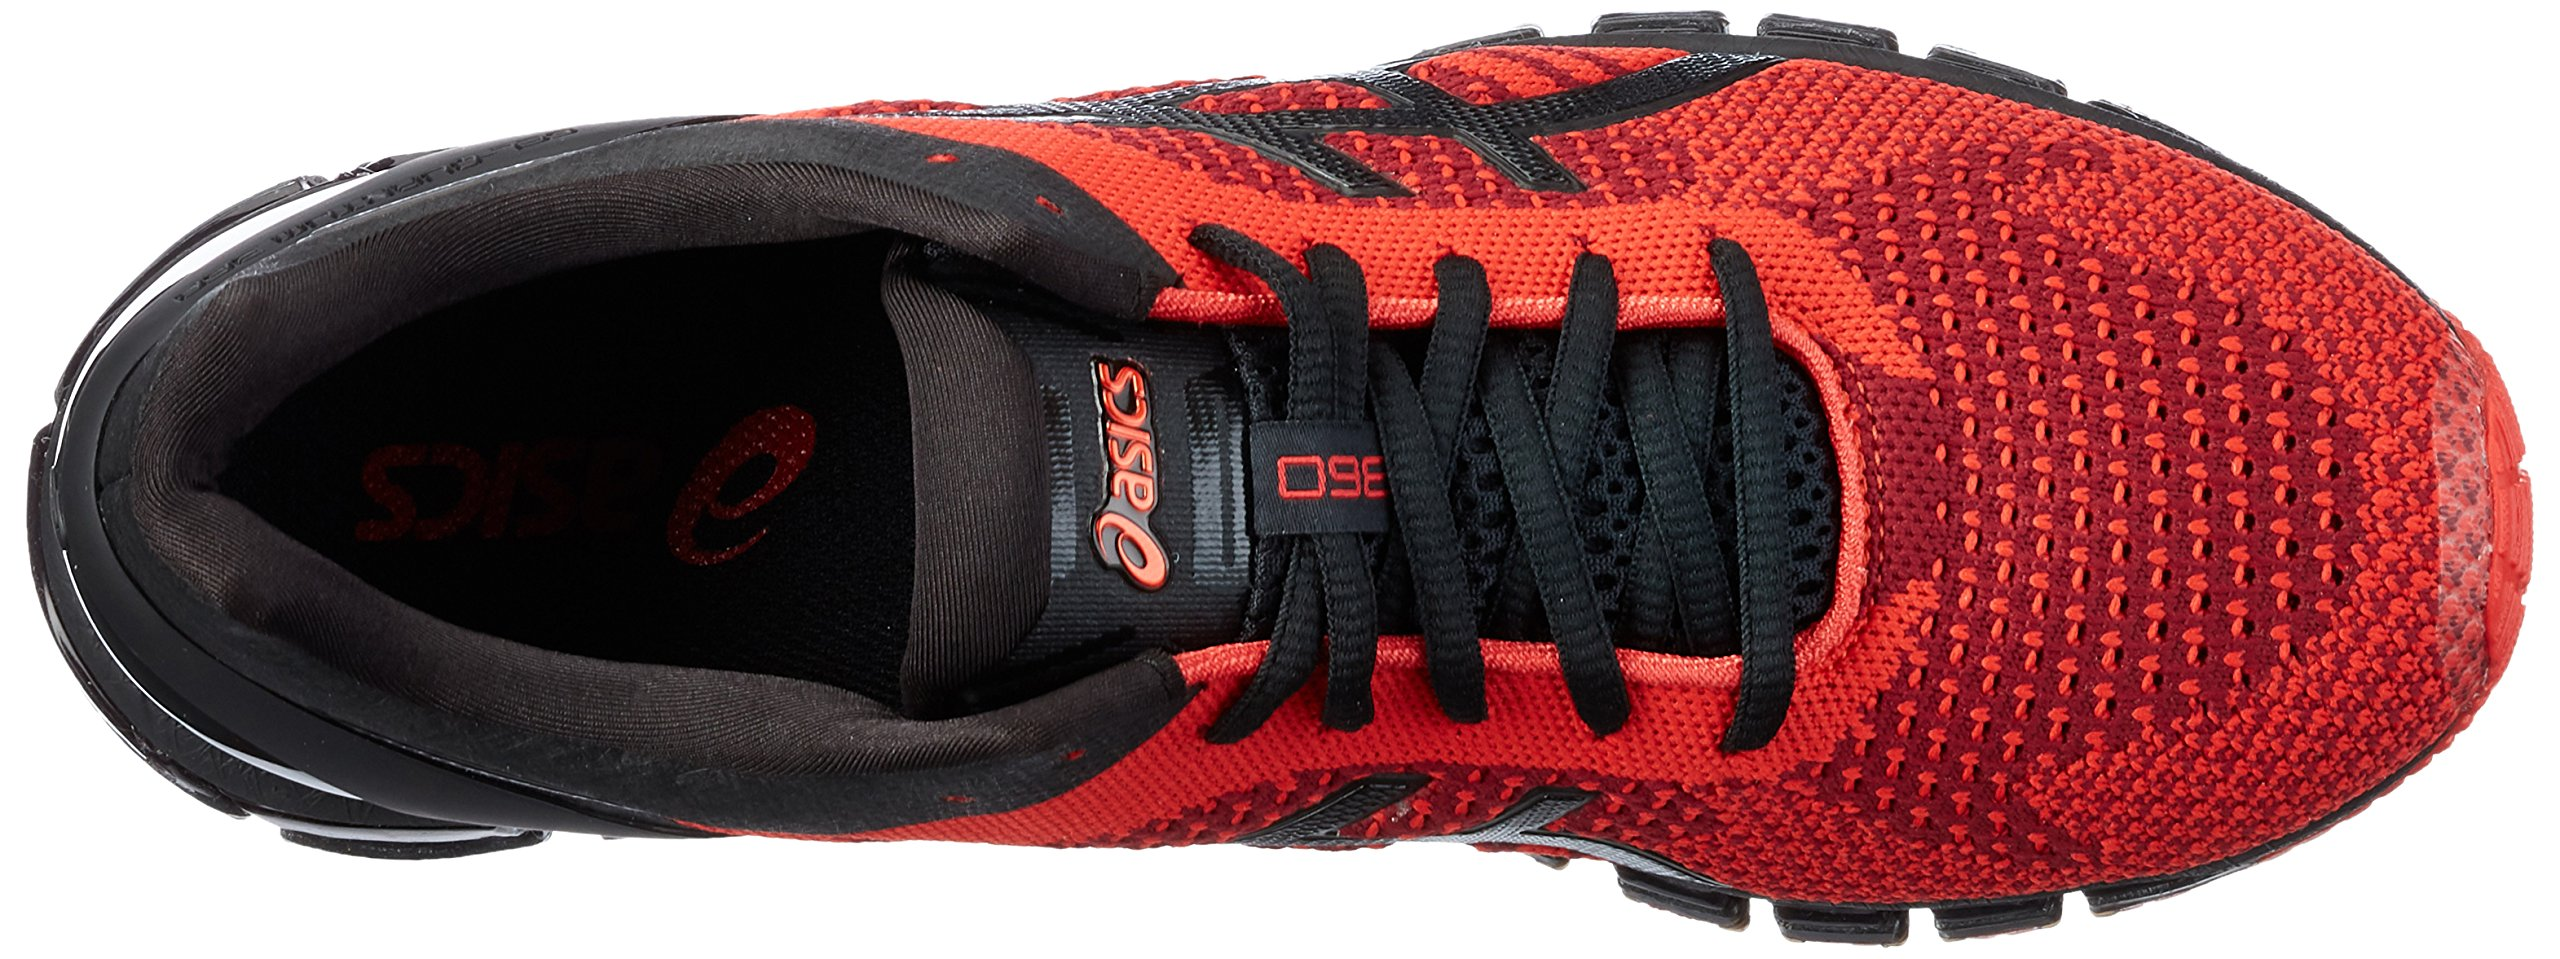 ASICS Men's Gel-Quantum 360 Knit Training Shoes